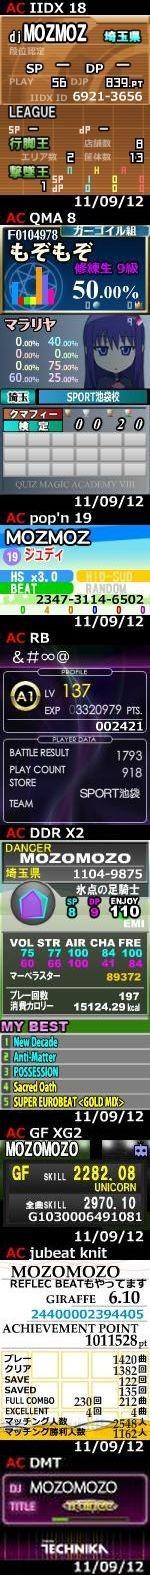 20110912174940